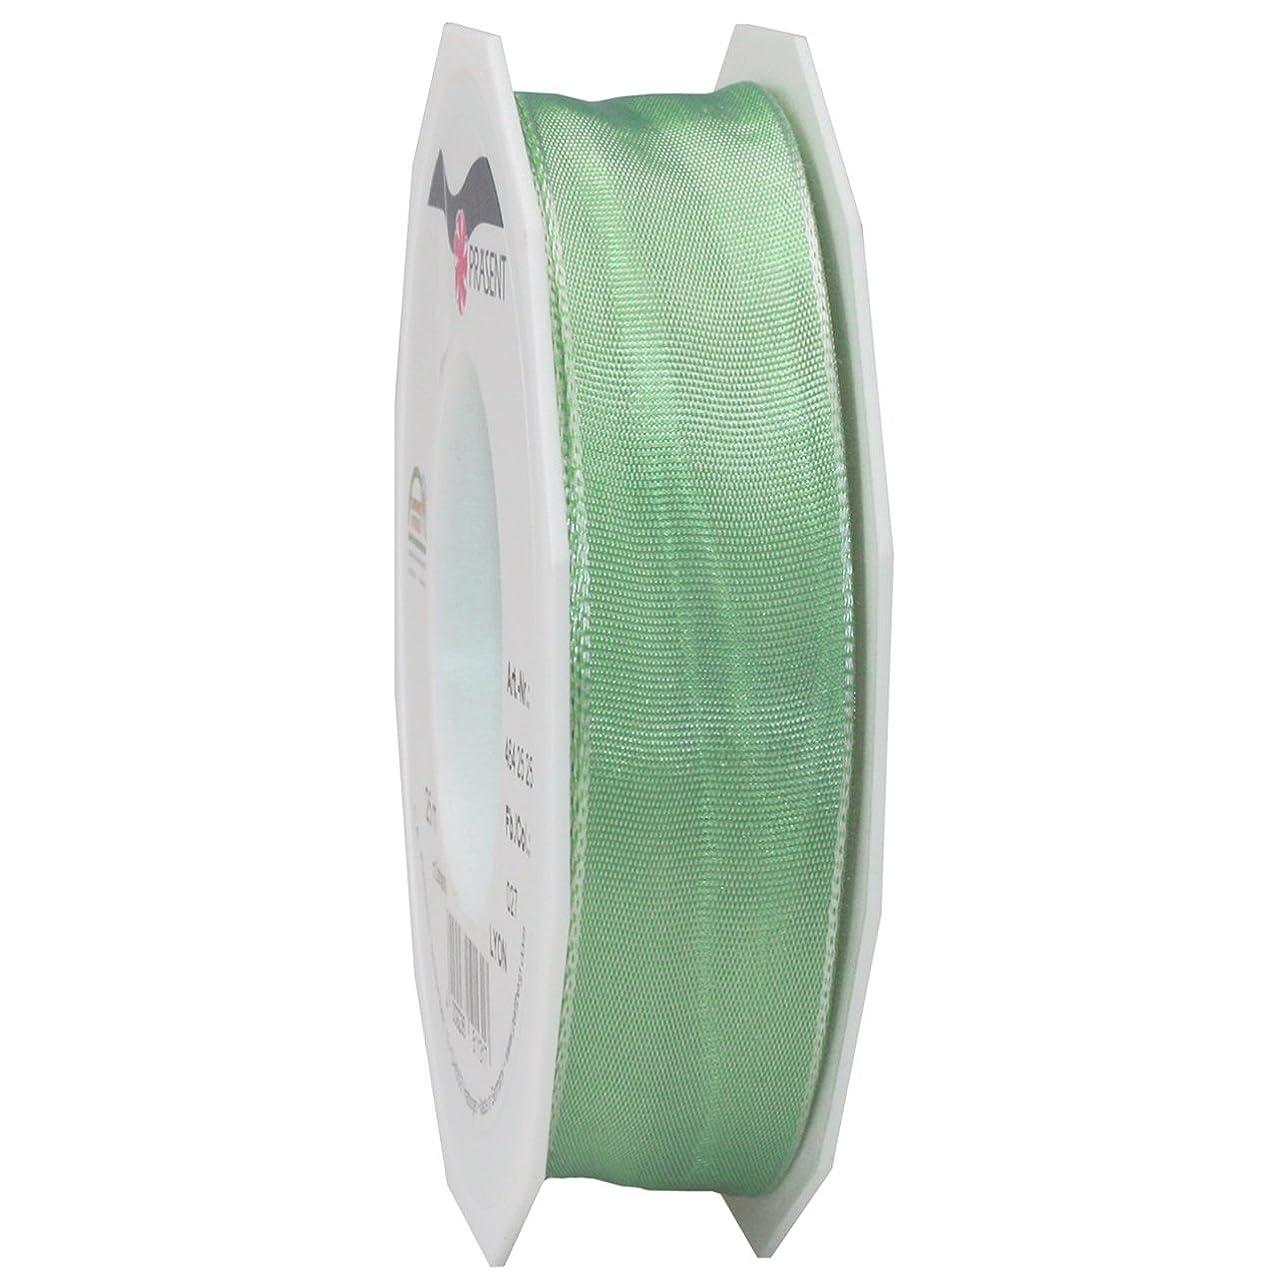 Morex Ribbon French Wired Lyon Ribbon, 1-Inch by 27-Yard Spool, Mint Green